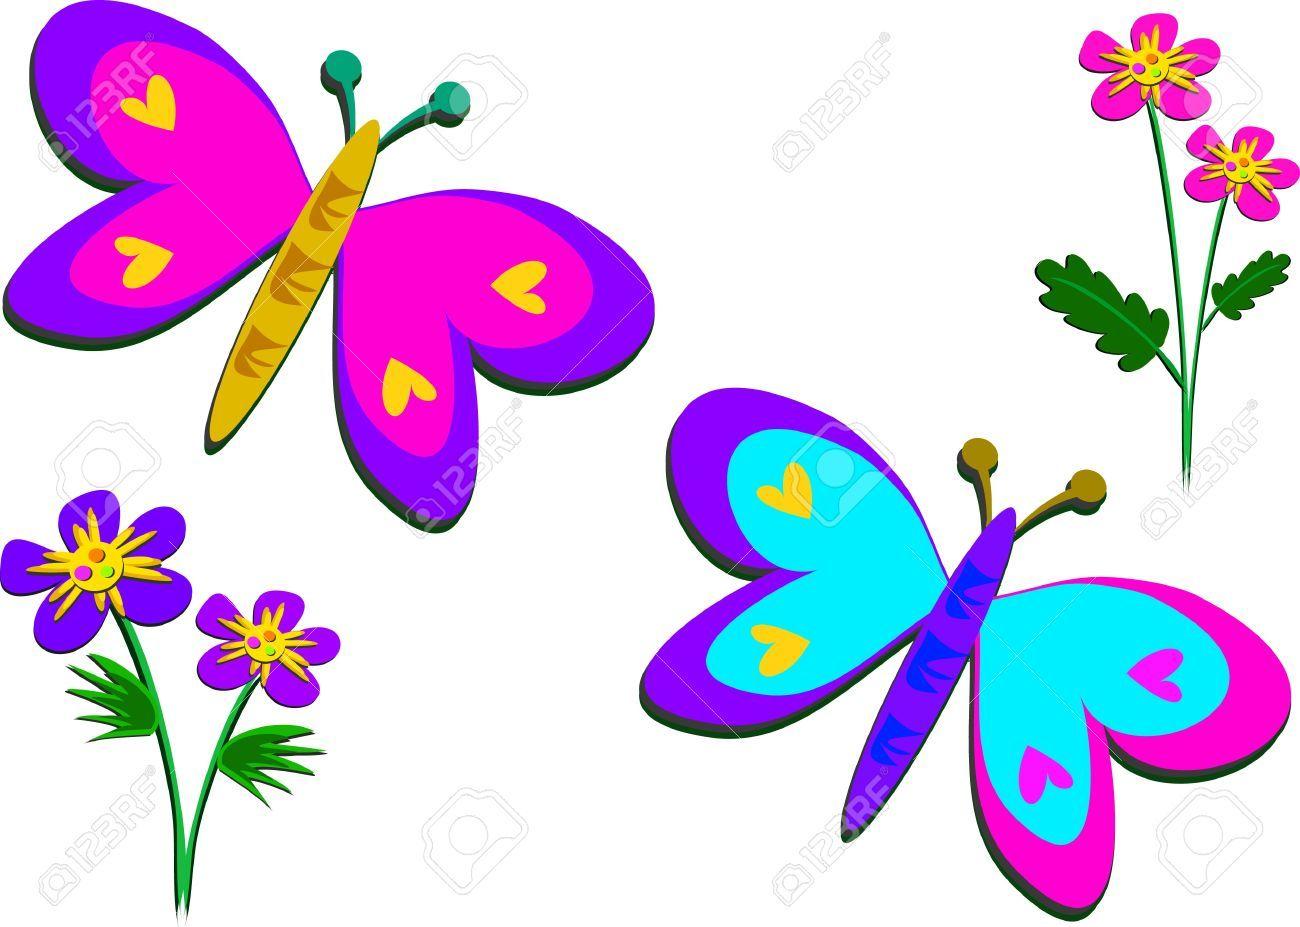 Butterfly flowers clipart 2 » Clipart Portal.